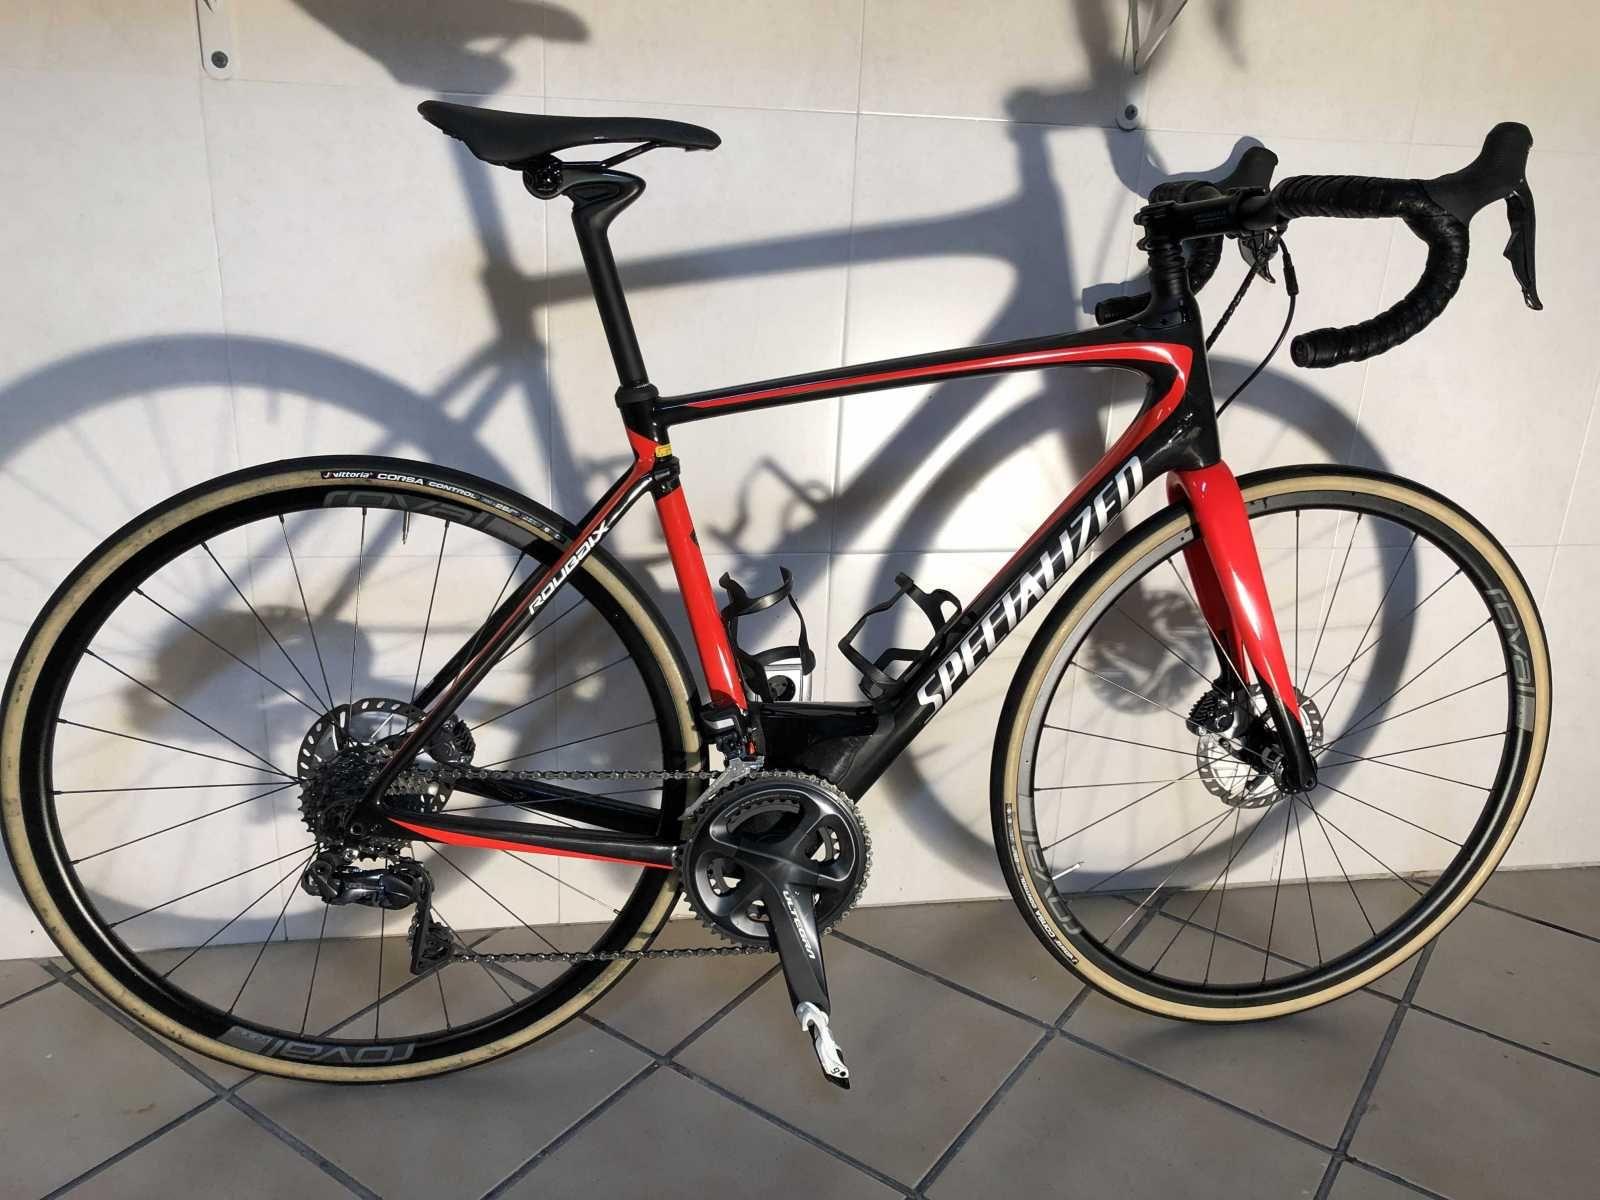 Bicicleta de carretera Specialized Roubaix. Ref 43023